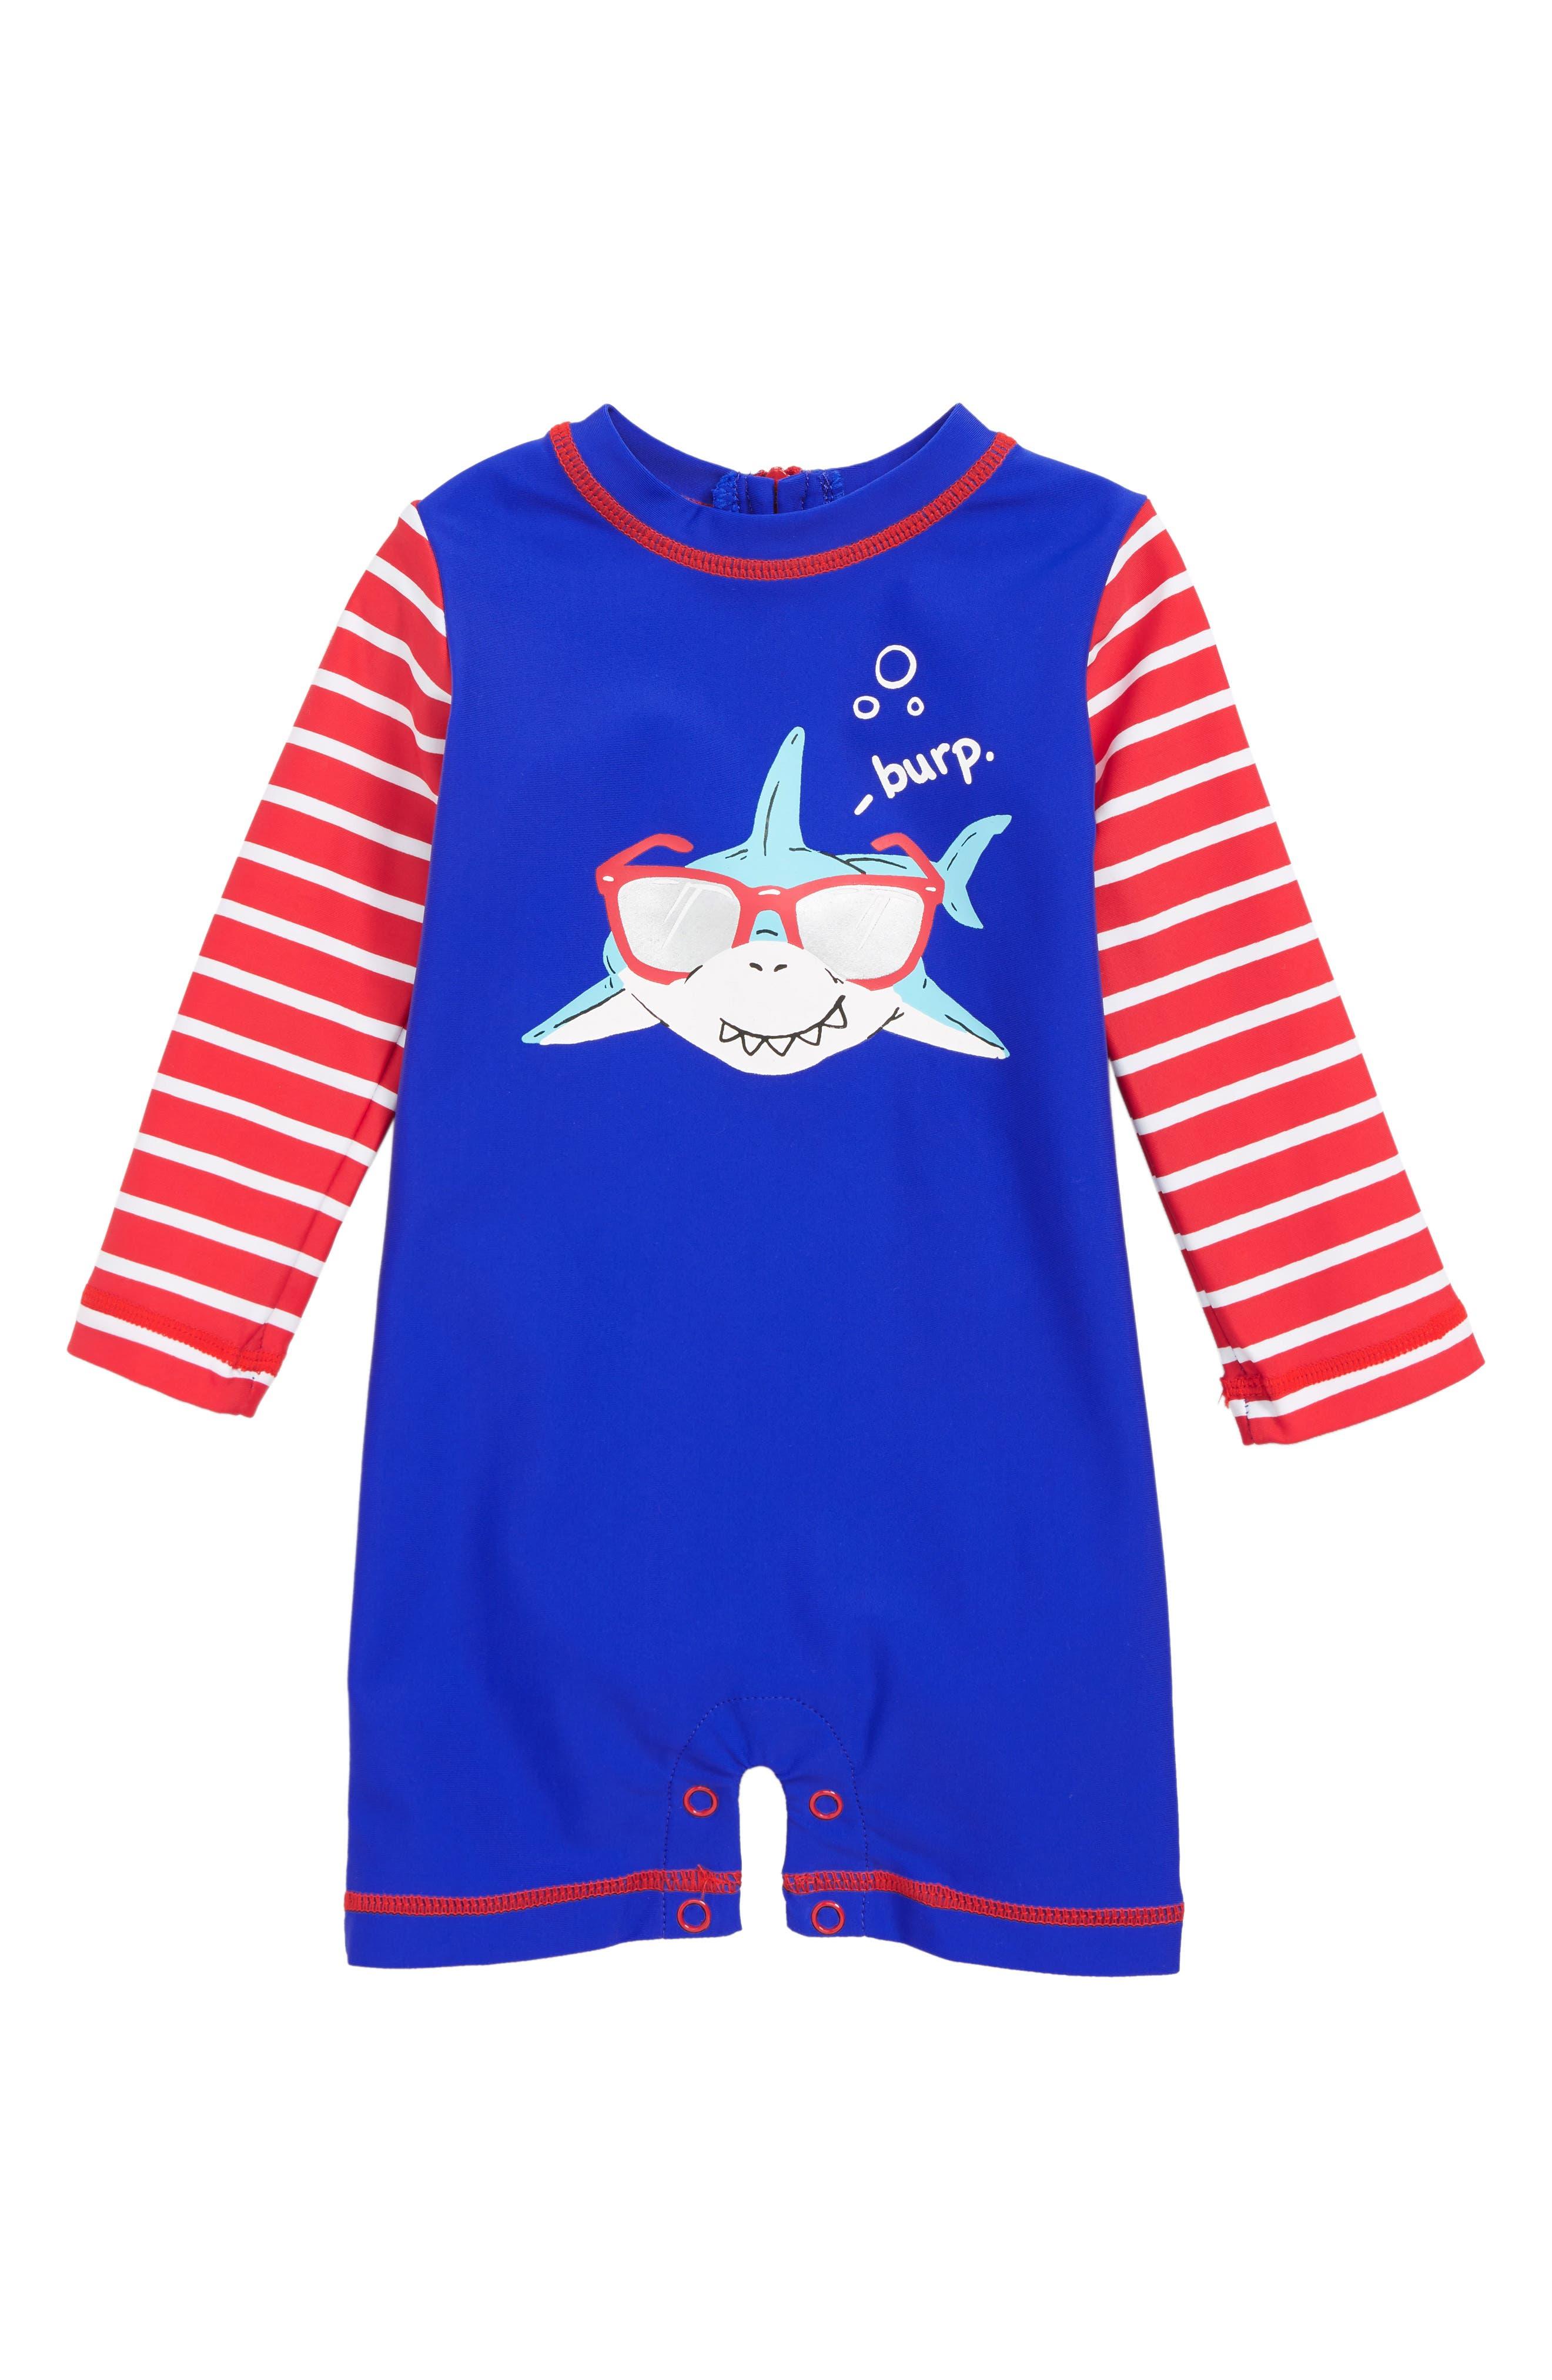 HATLEY, Cool Shark One-Piece Rashguard Swimsuit, Main thumbnail 1, color, BLUE